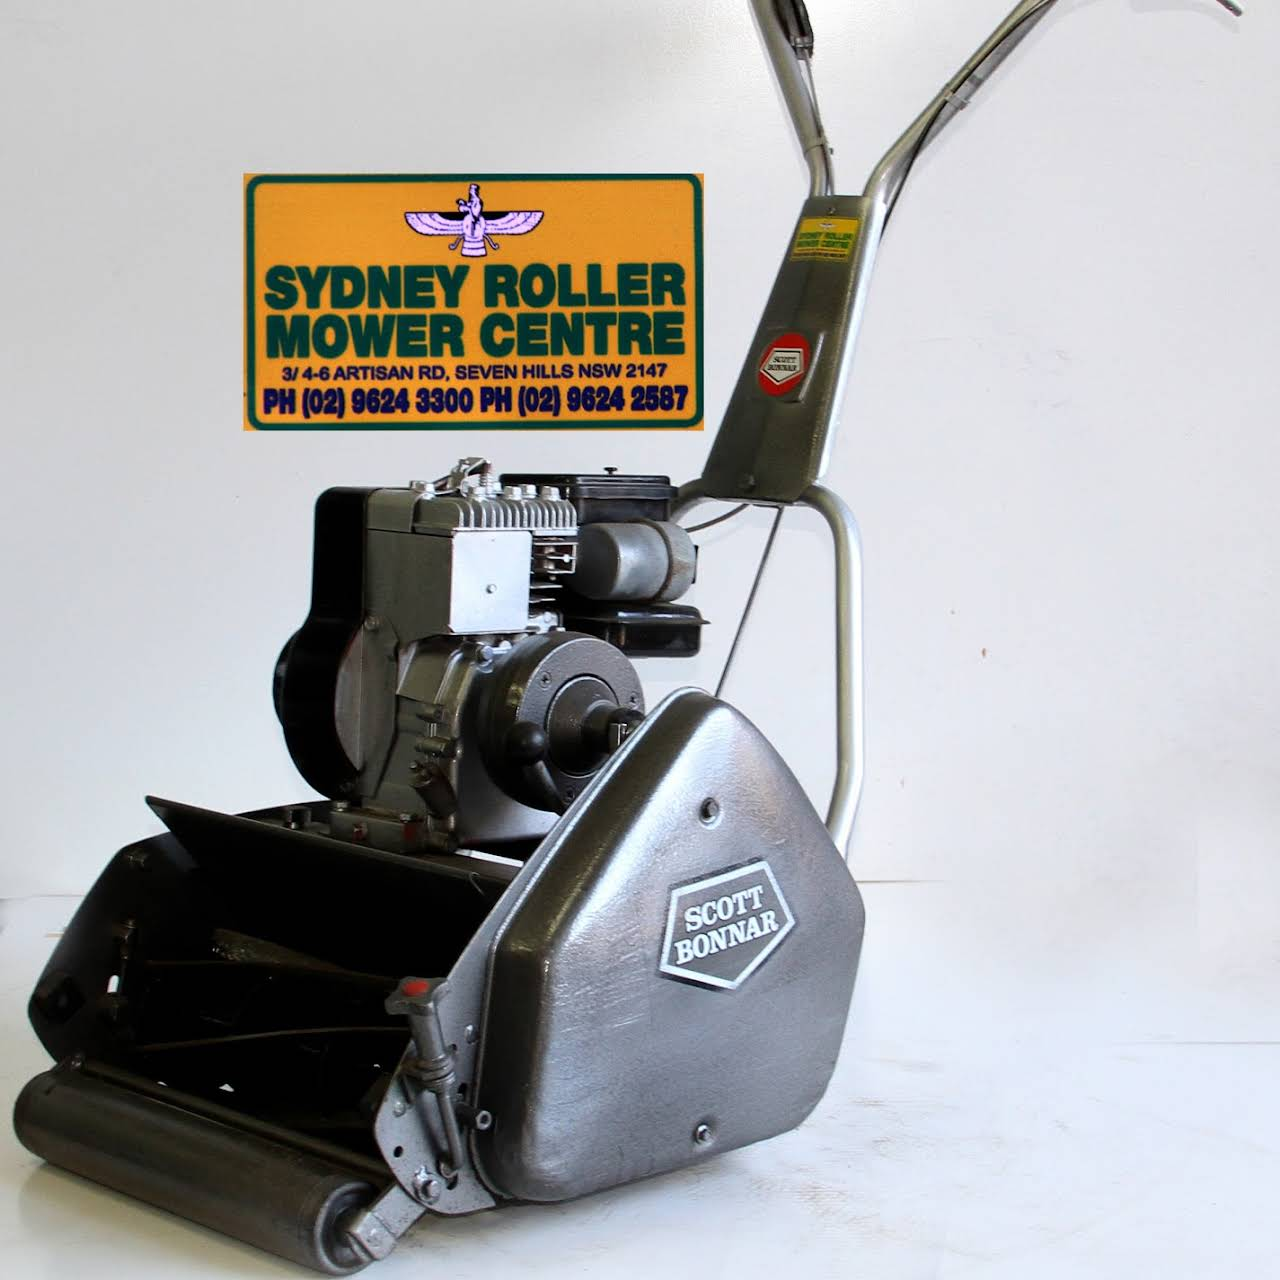 Sydney Roller Mower Centre - Lawn Mower Repair Service in